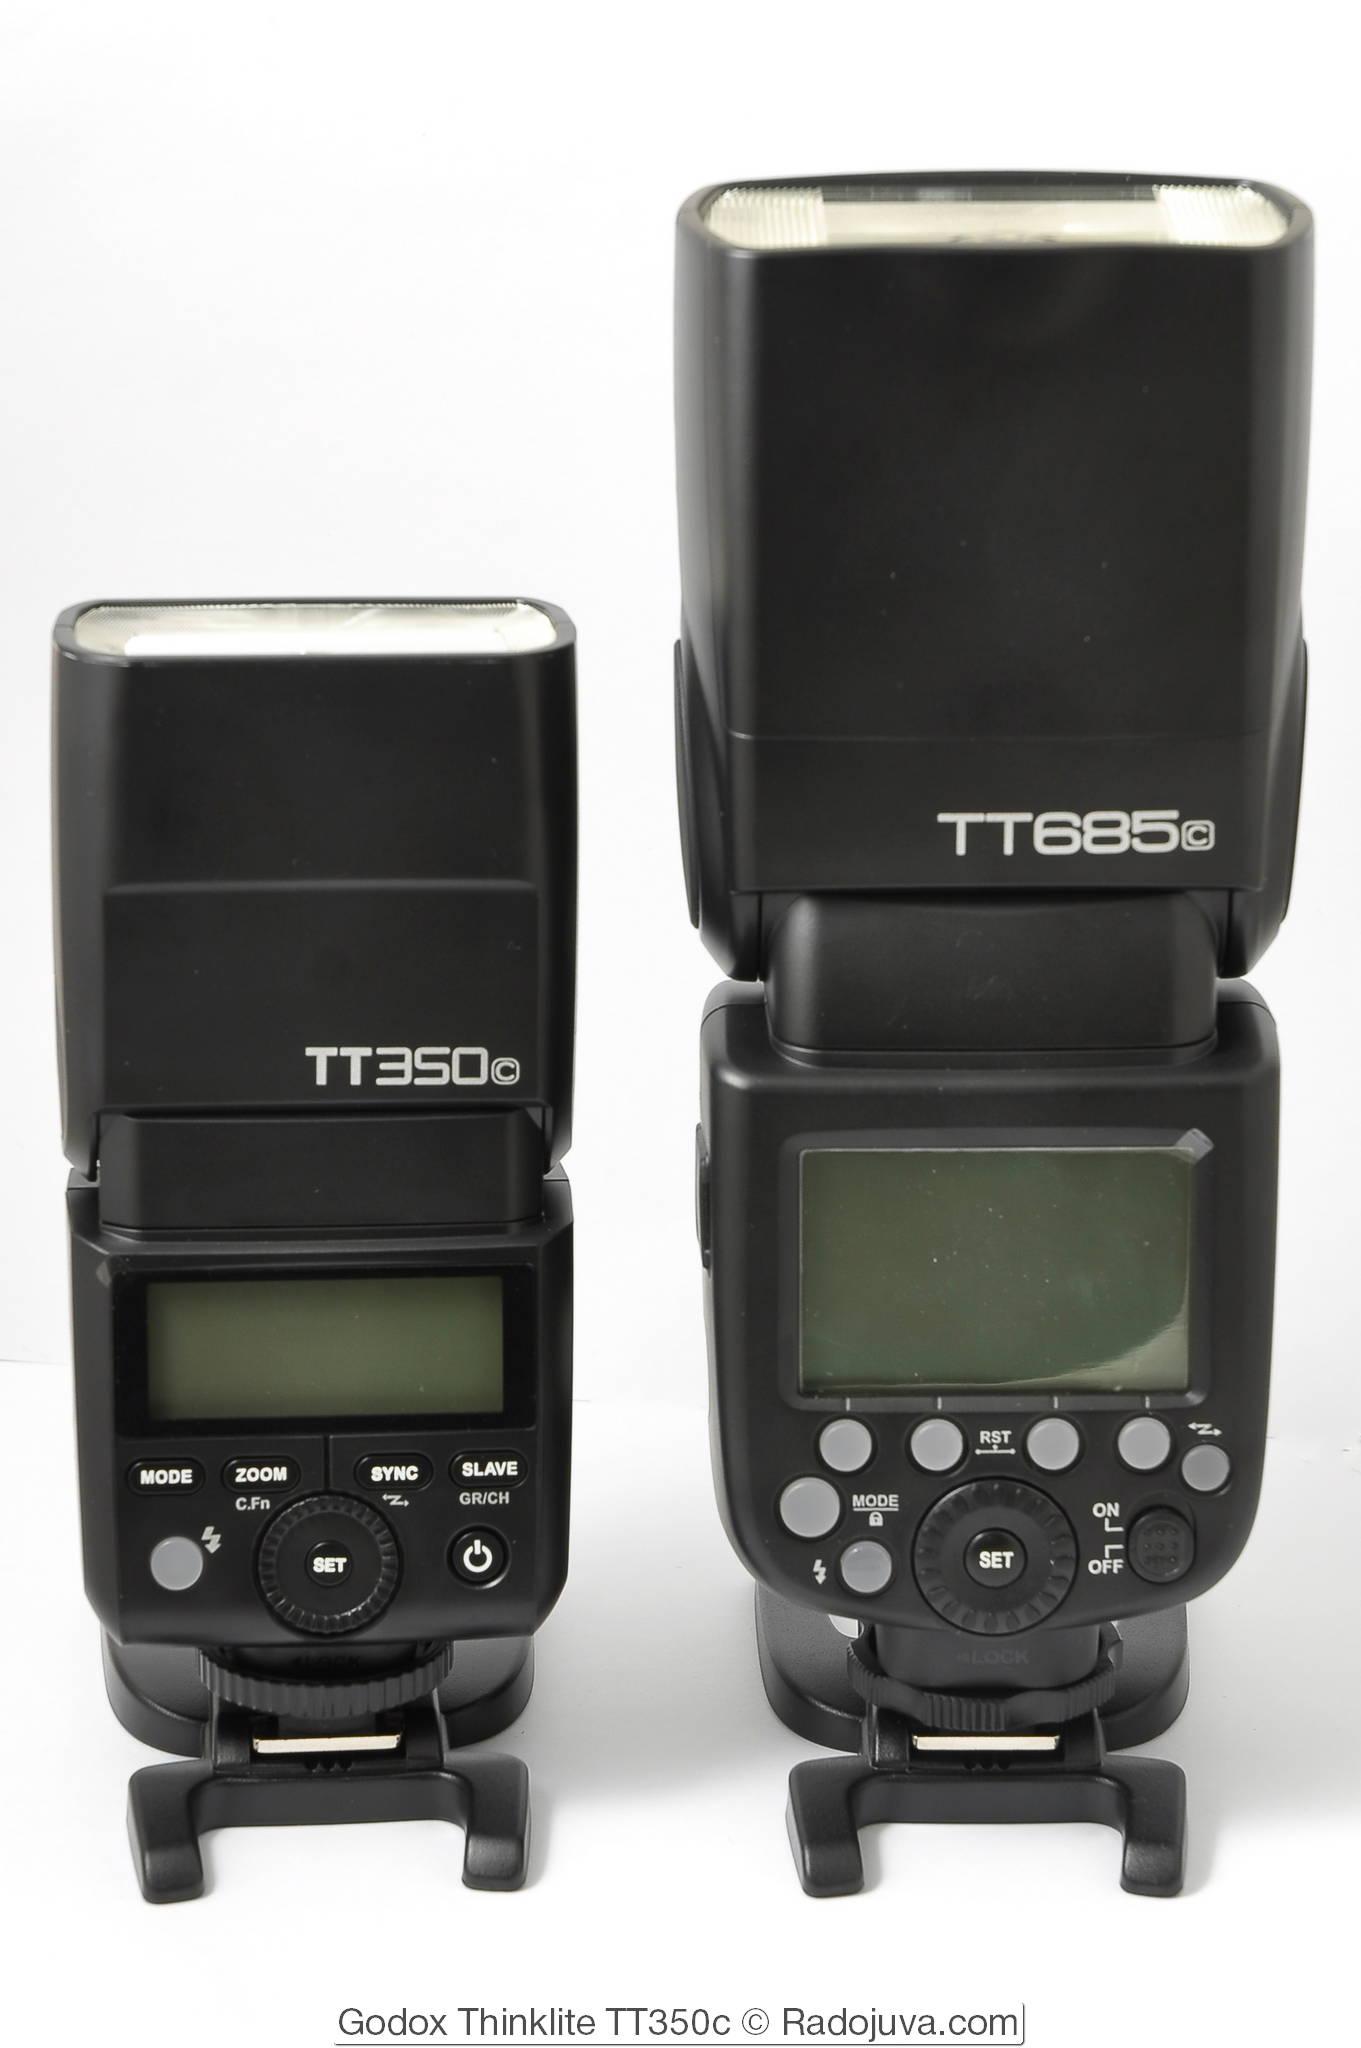 Размеры Godox Thinklite TT350c и Godox ThinkLite TT685c